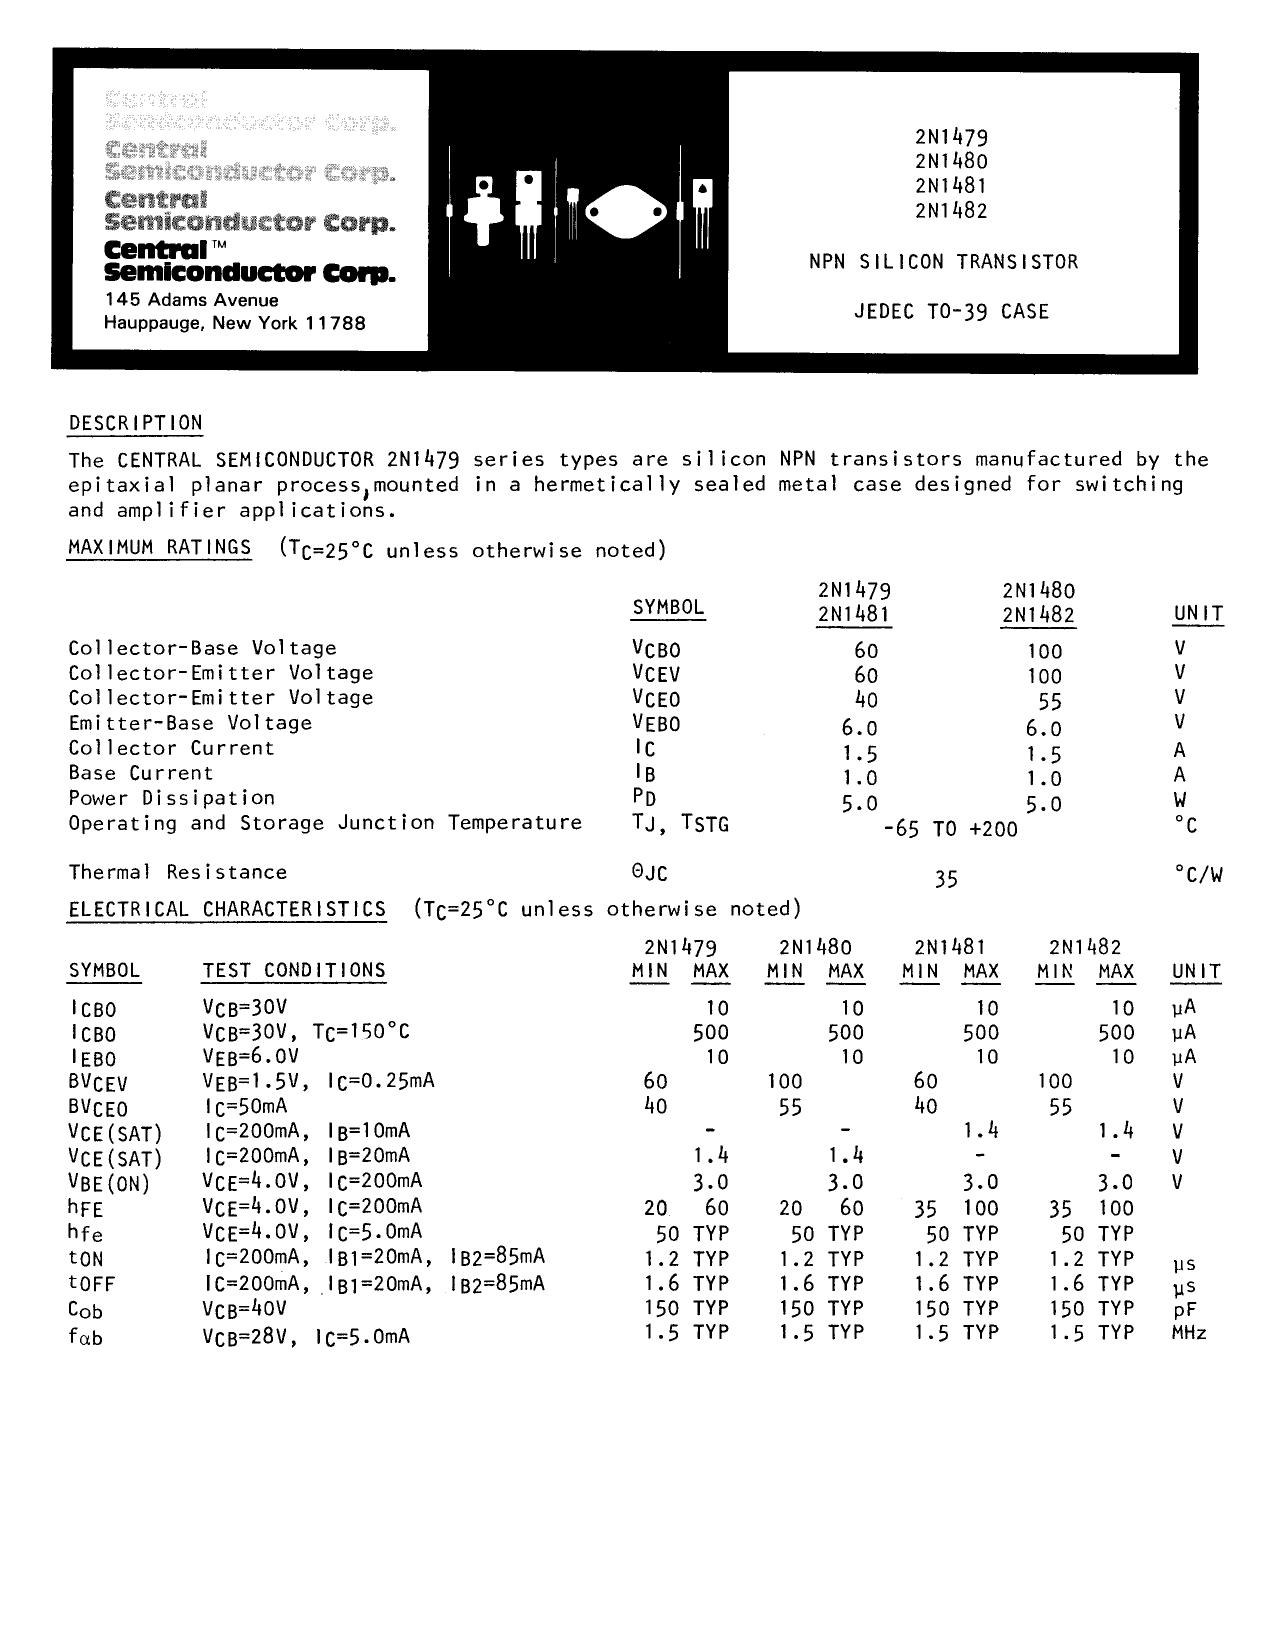 2N1482 datasheet